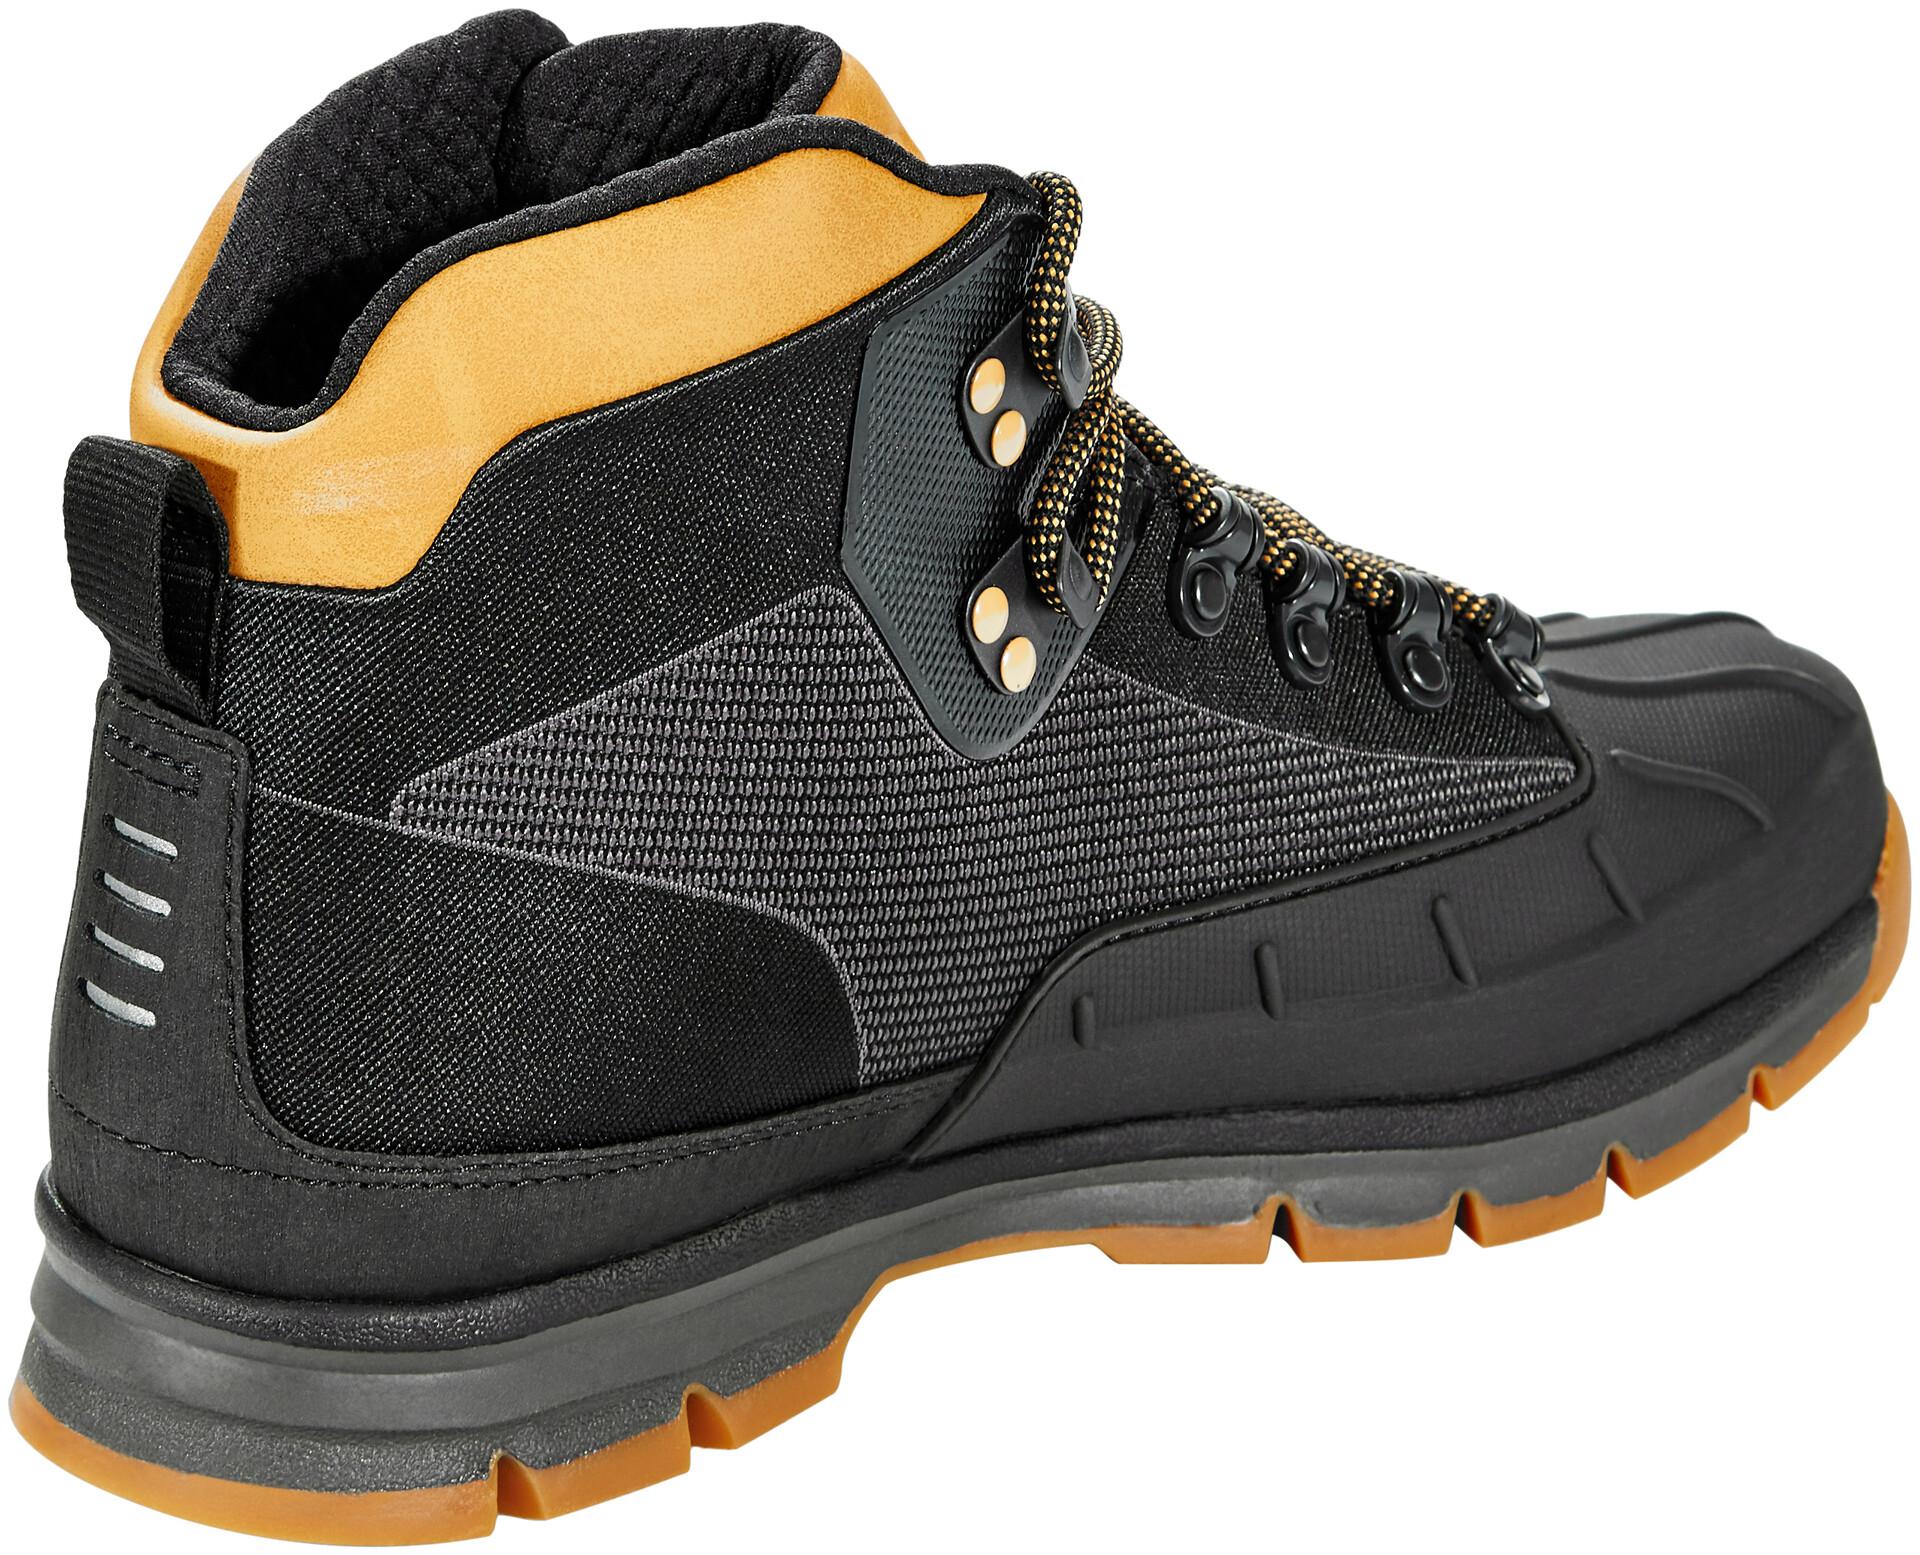 Timberland Euro Hiker Shell Toe Chaussures Jacquard Homme, blackwheat